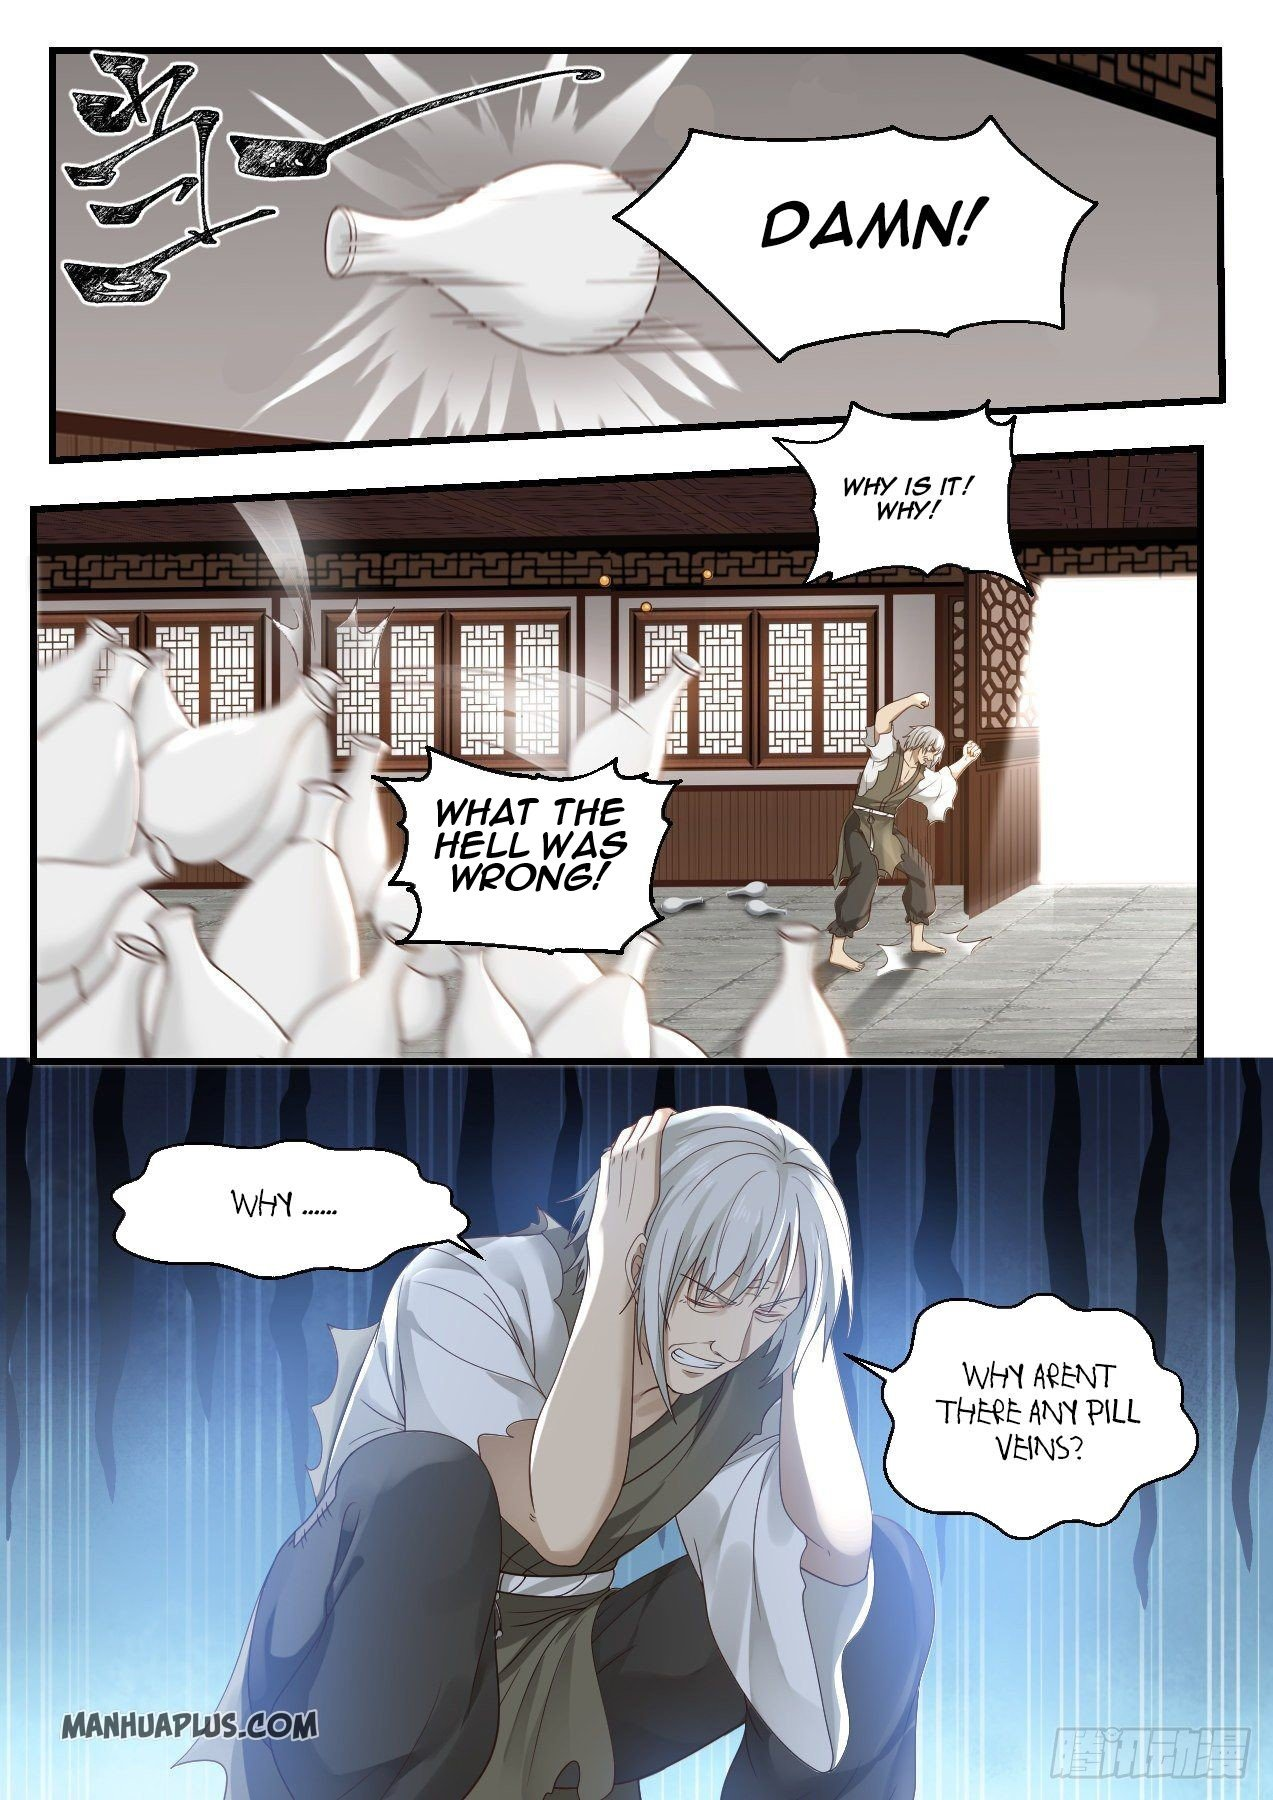 Martial Peak - chapter 932-eng-li